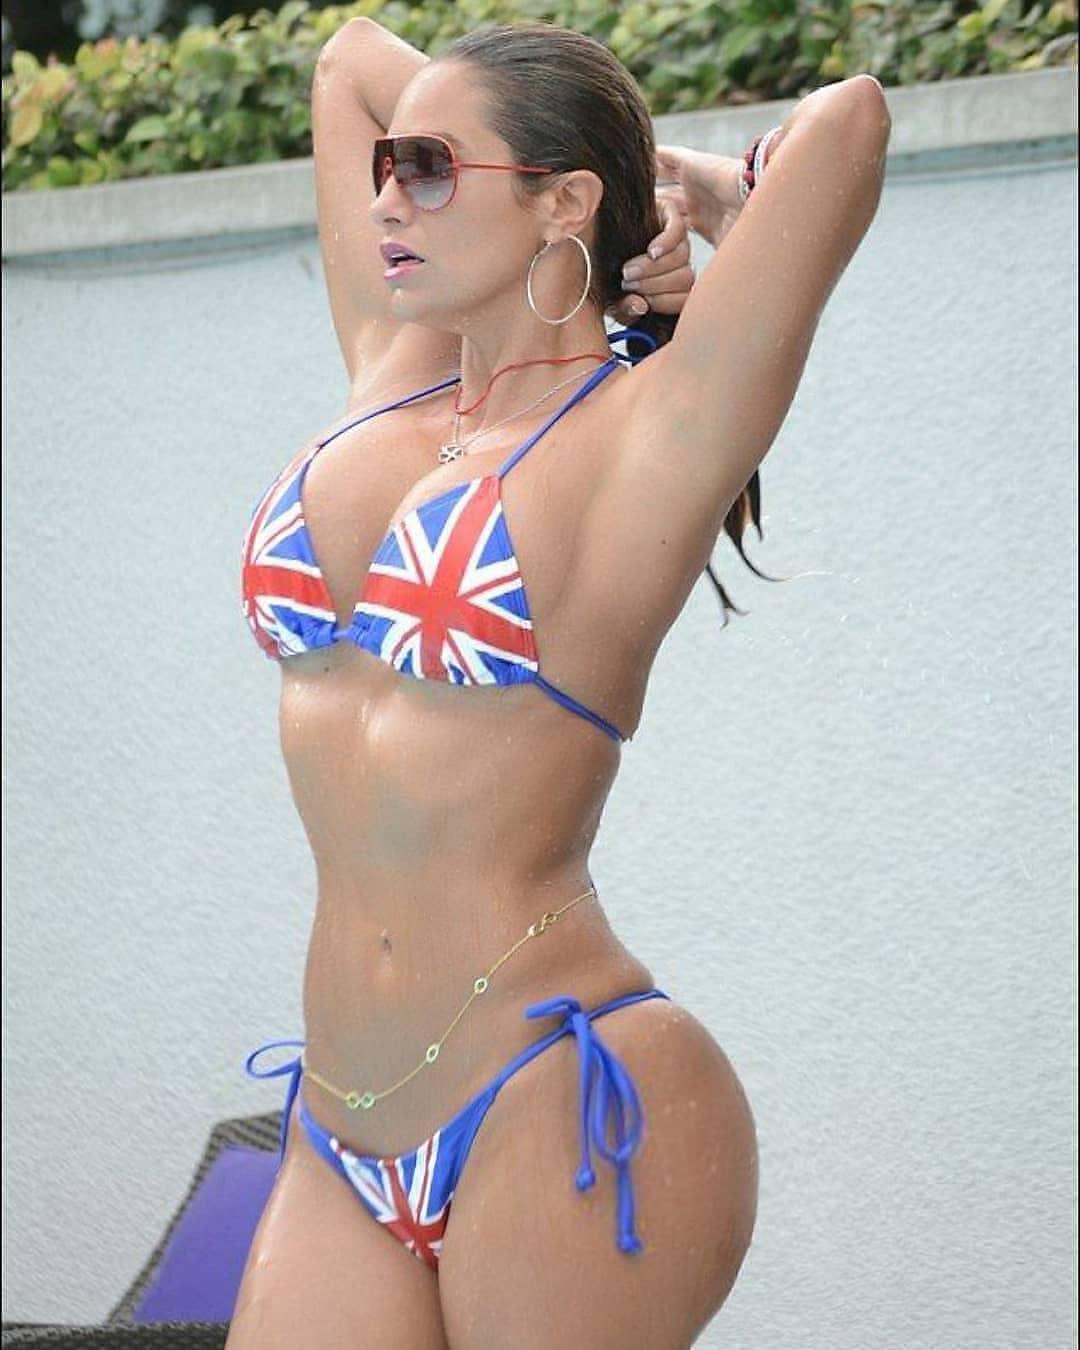 Bikini Shakiray Locura HiloDesatan De La Su kXiPZTOu